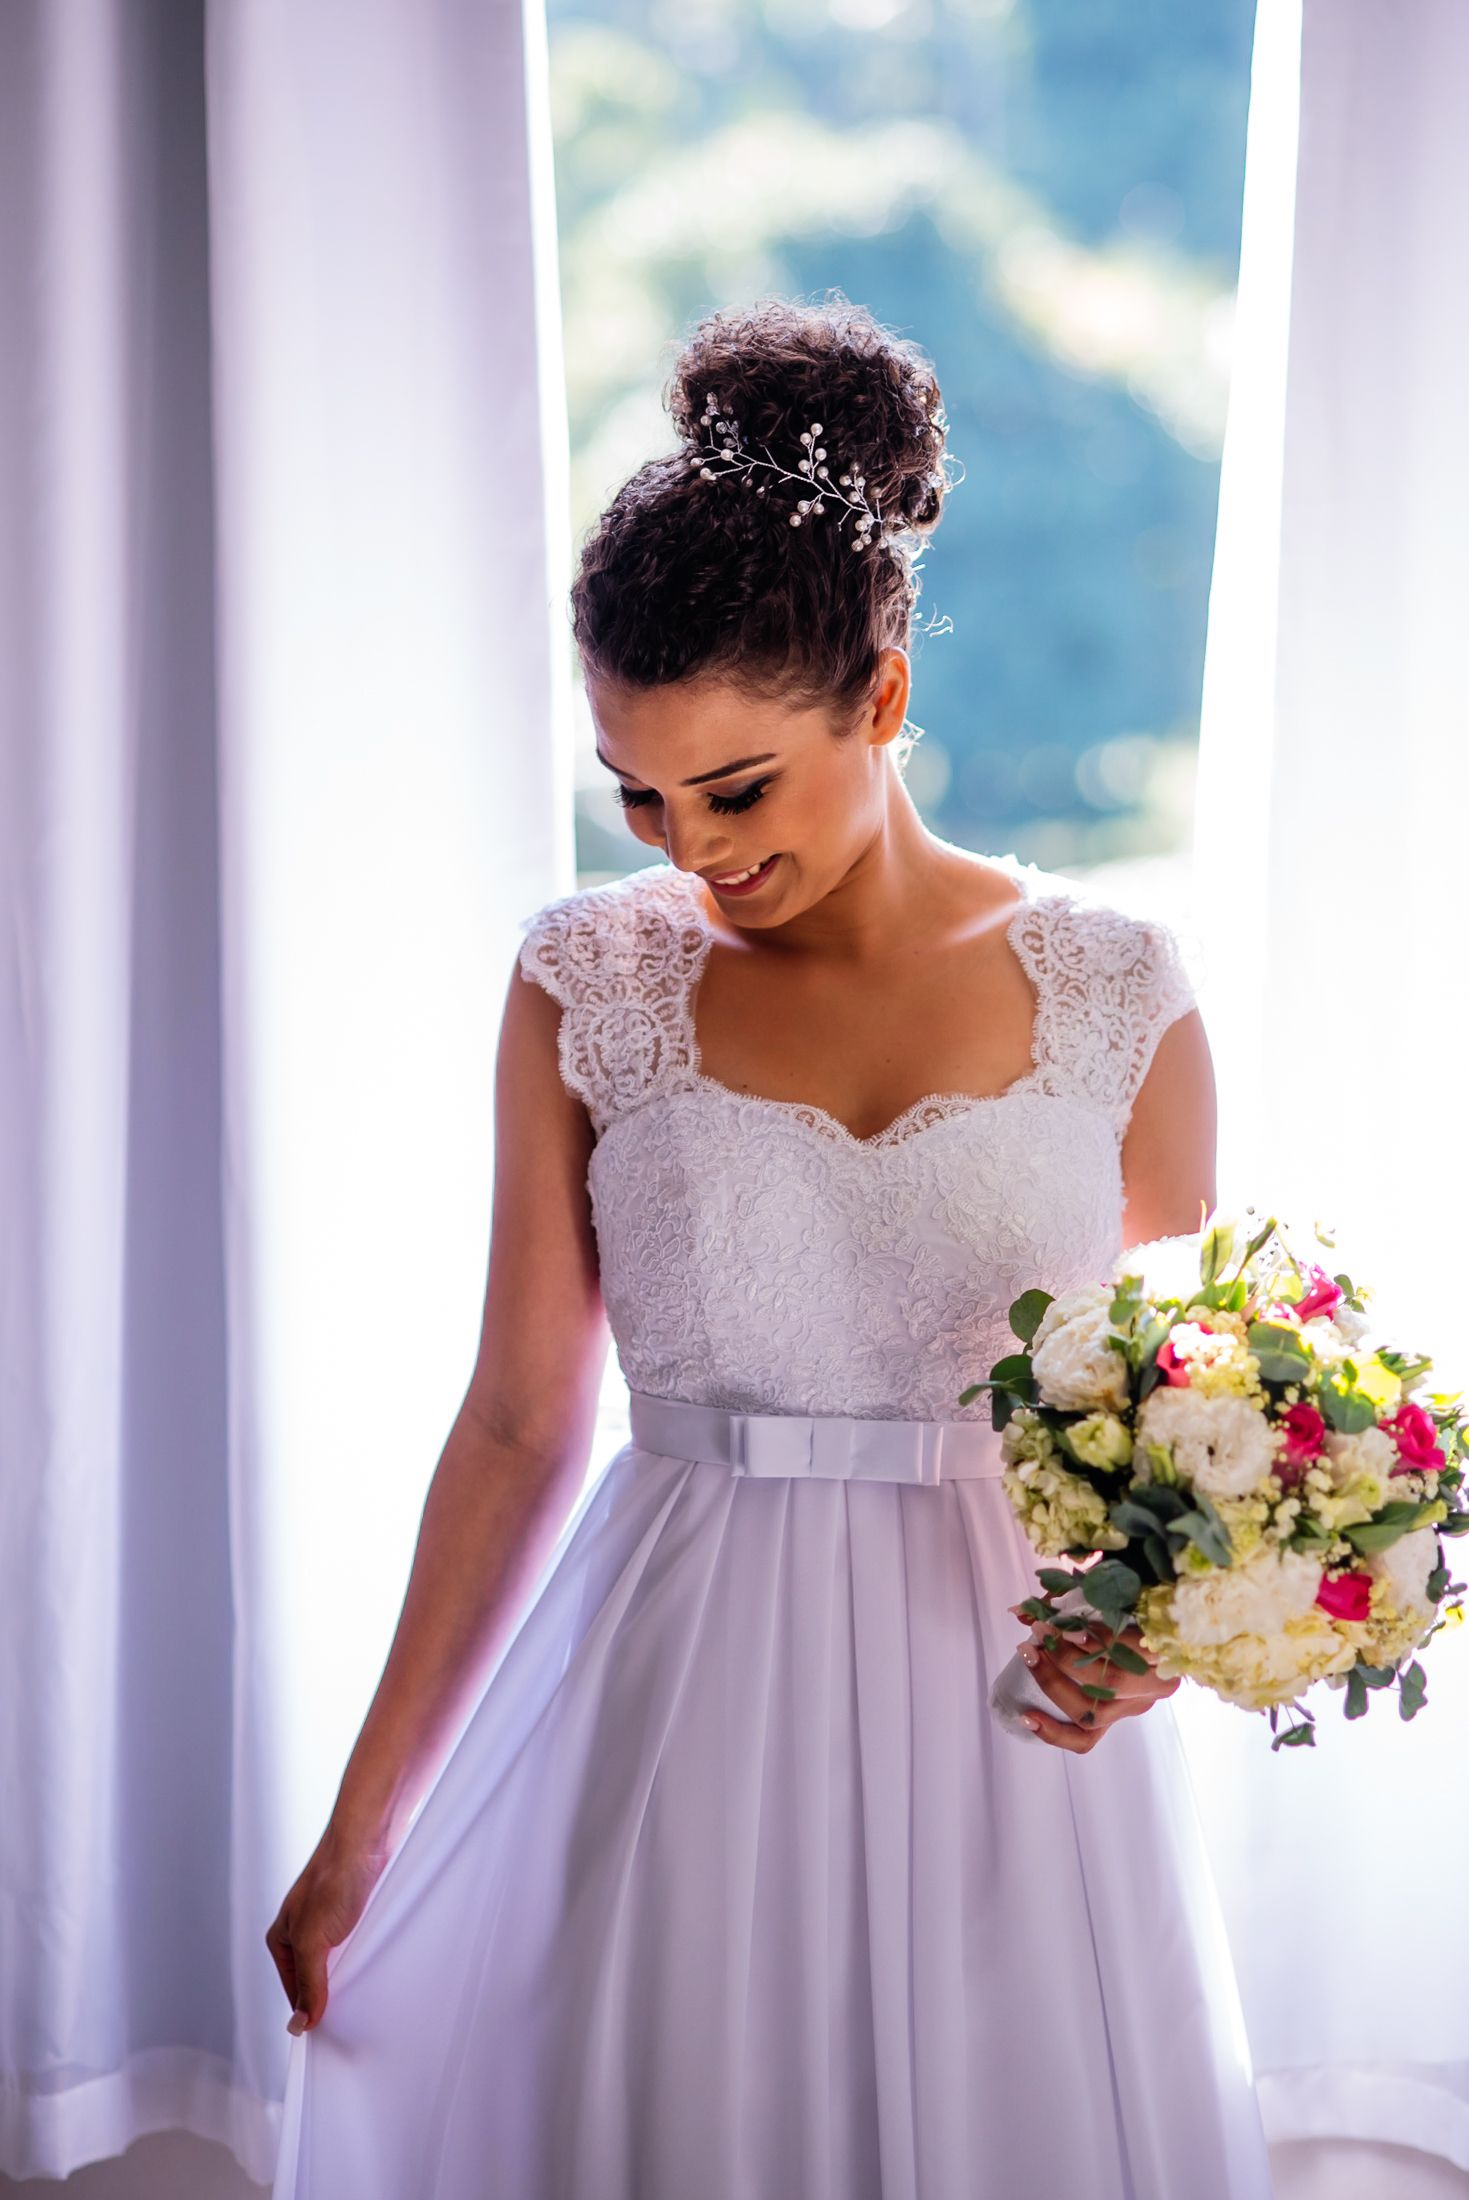 Vestido De Noiva Simples Casamento De Dia Aliexpress